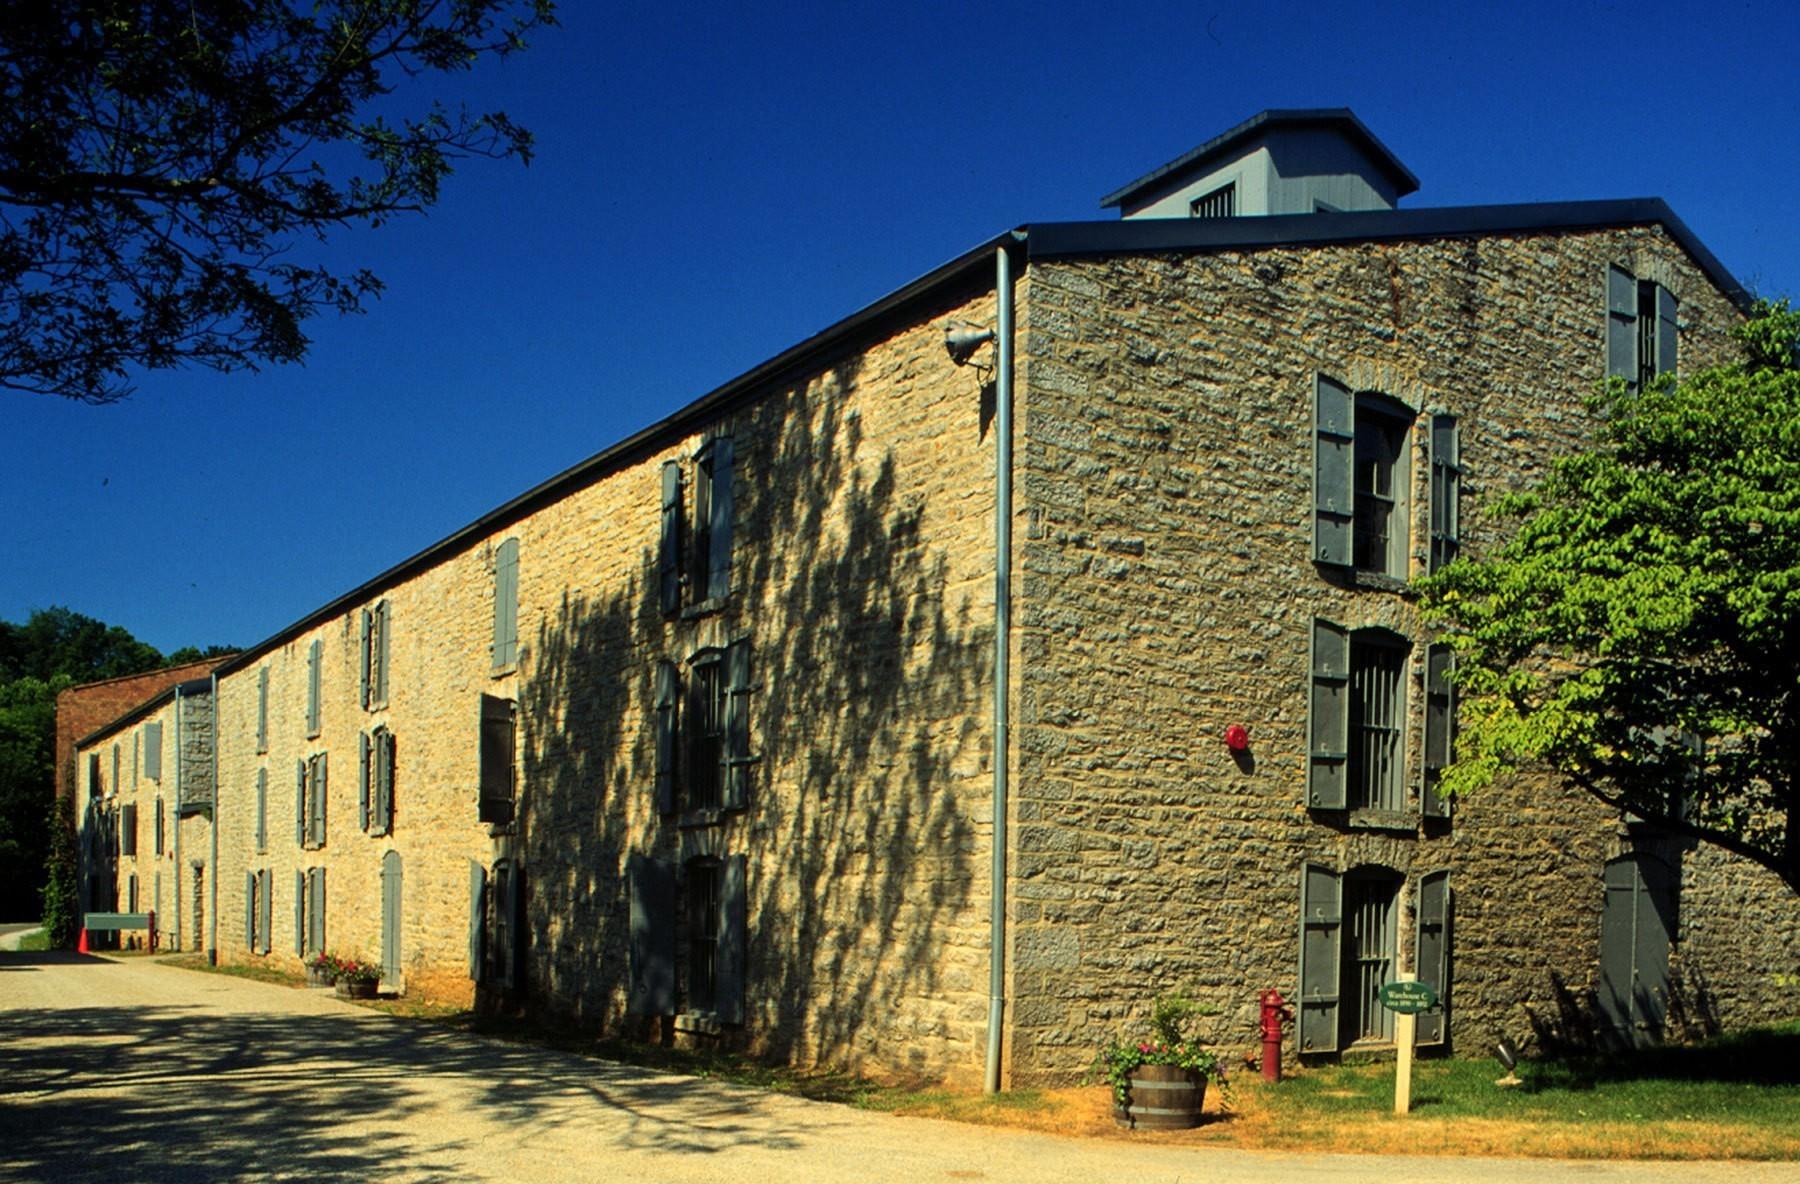 woodford-reserve-distillery-restoration-visitor-center-exterior